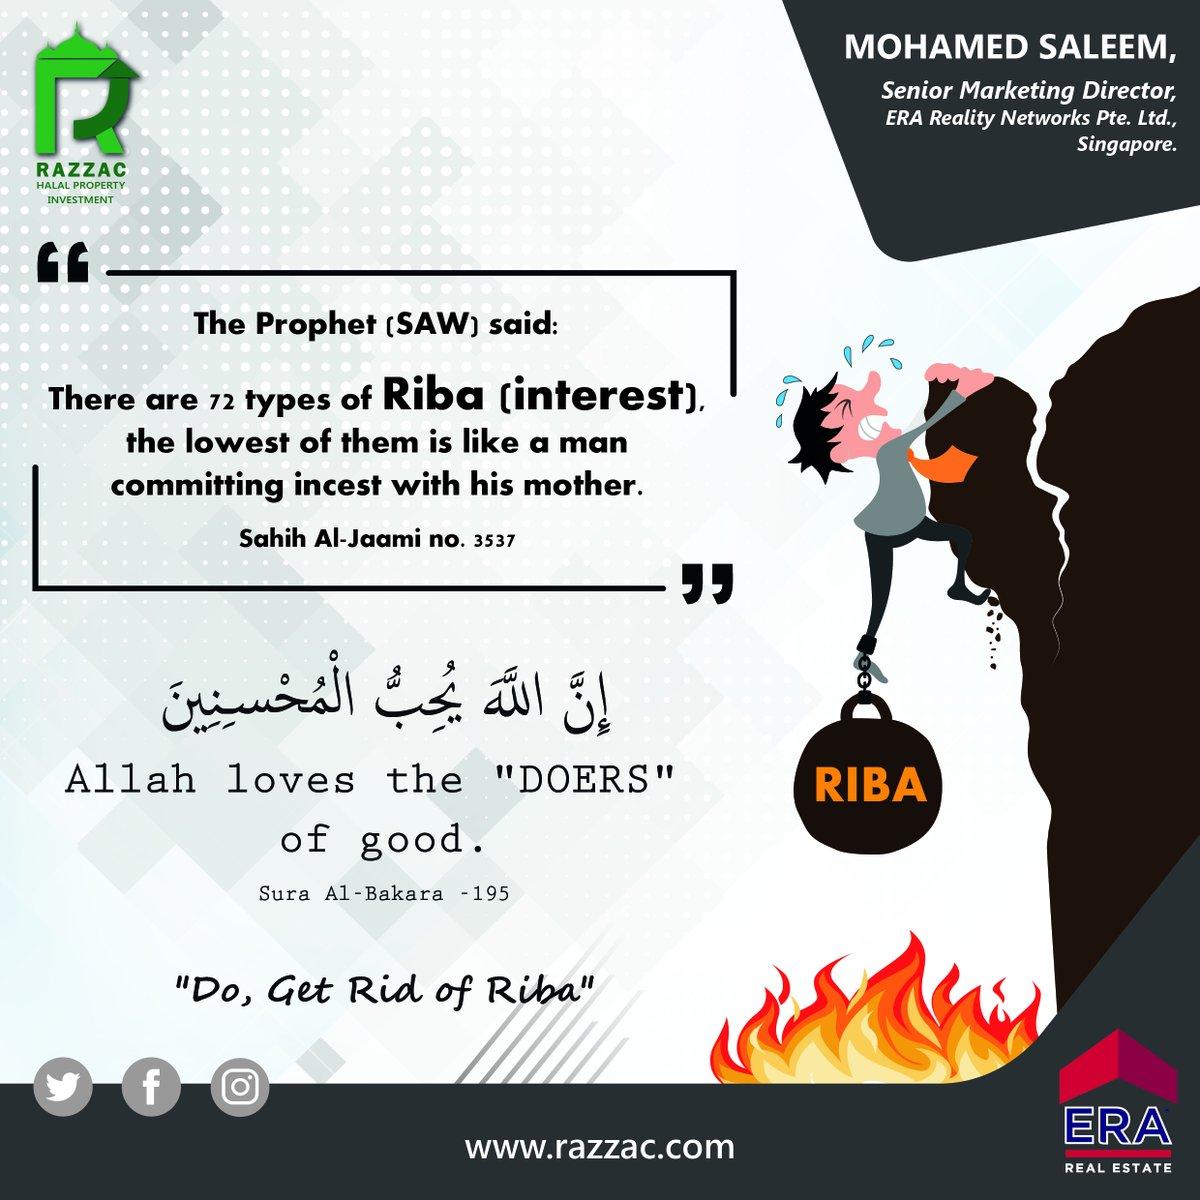 RAZZAC HALAL INVESTMENTS  Do, Get Rid Of Riba  #halal #halalinvestment #halalinvestments #islam #islamic #islamicquotes #islamicinvestment #property #propertymanagement #realestate #realestateagent #singapore #malaysia #singaporerealestate #malaysiarealestate #islamicrealestatepic.twitter.com/Fh6PyhbpMU